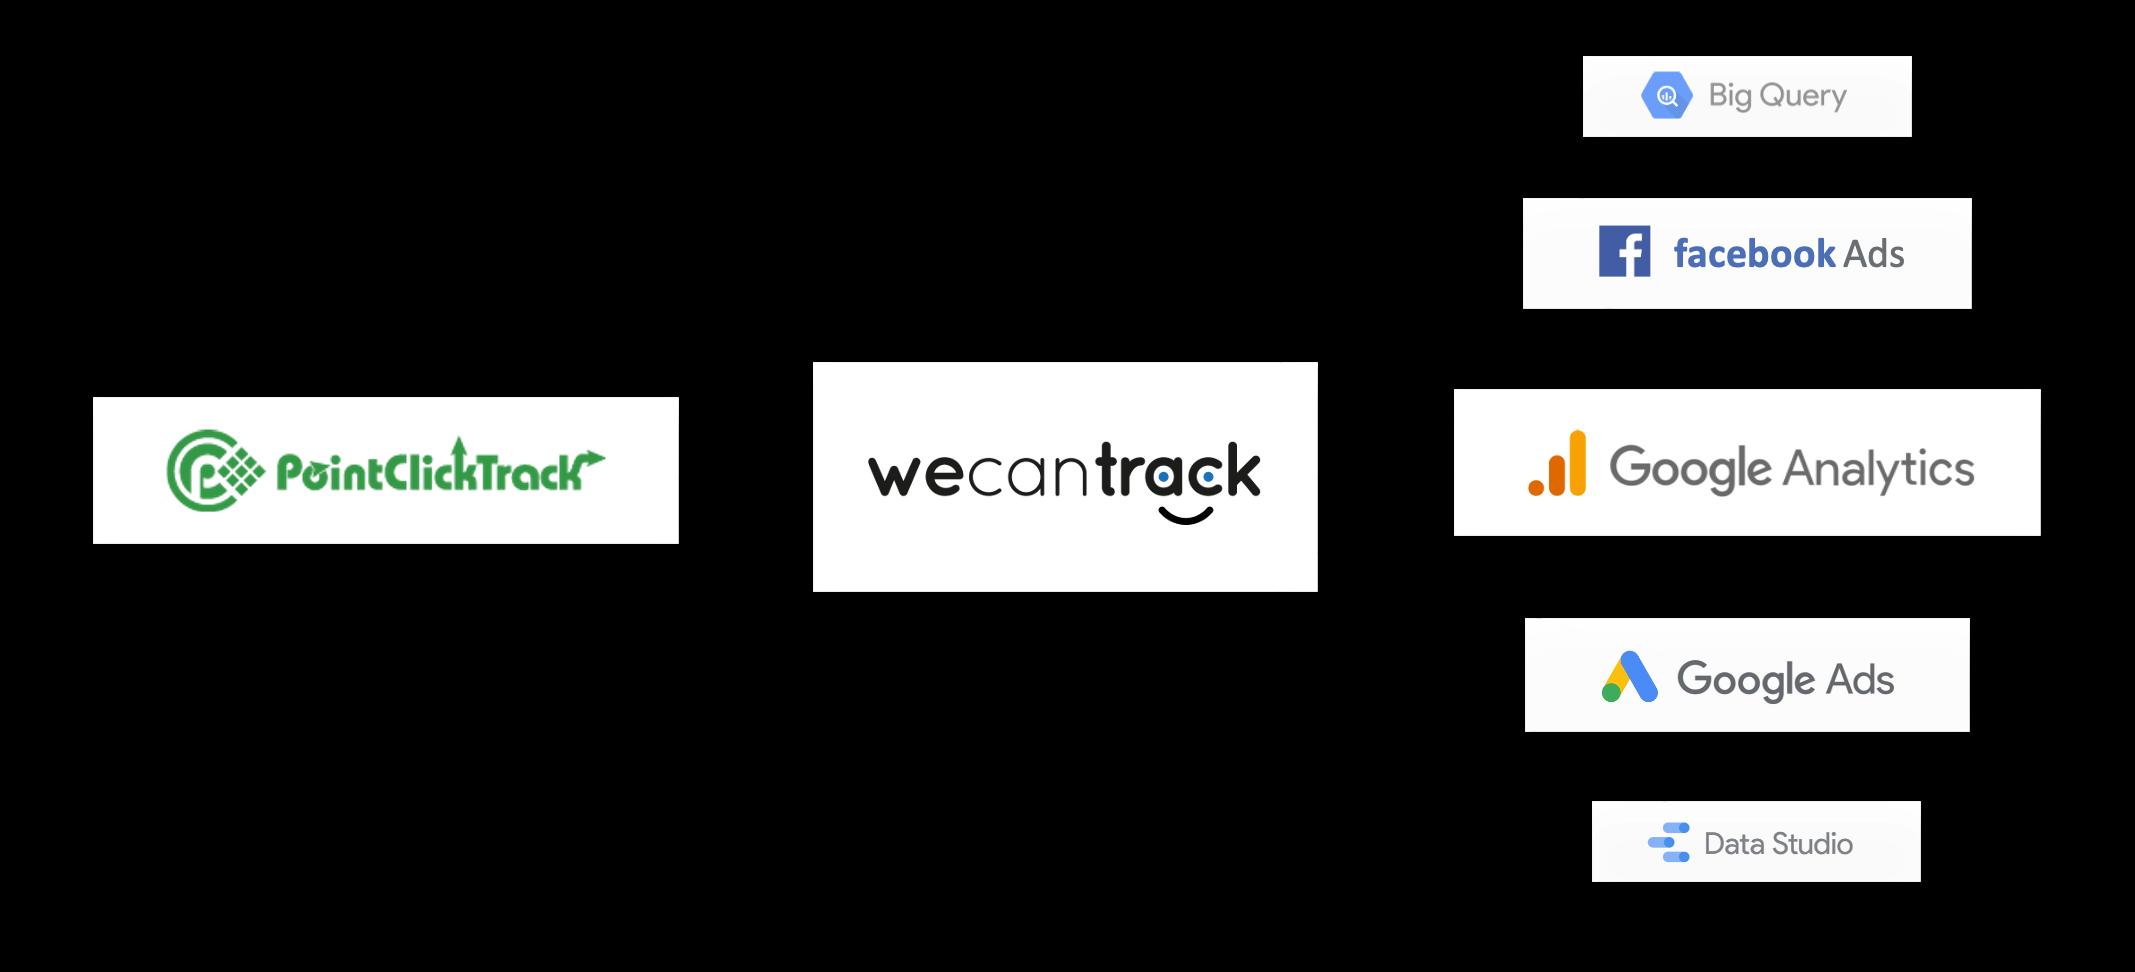 integrate-pointclicktrack-affiliate-conversions-via-postback